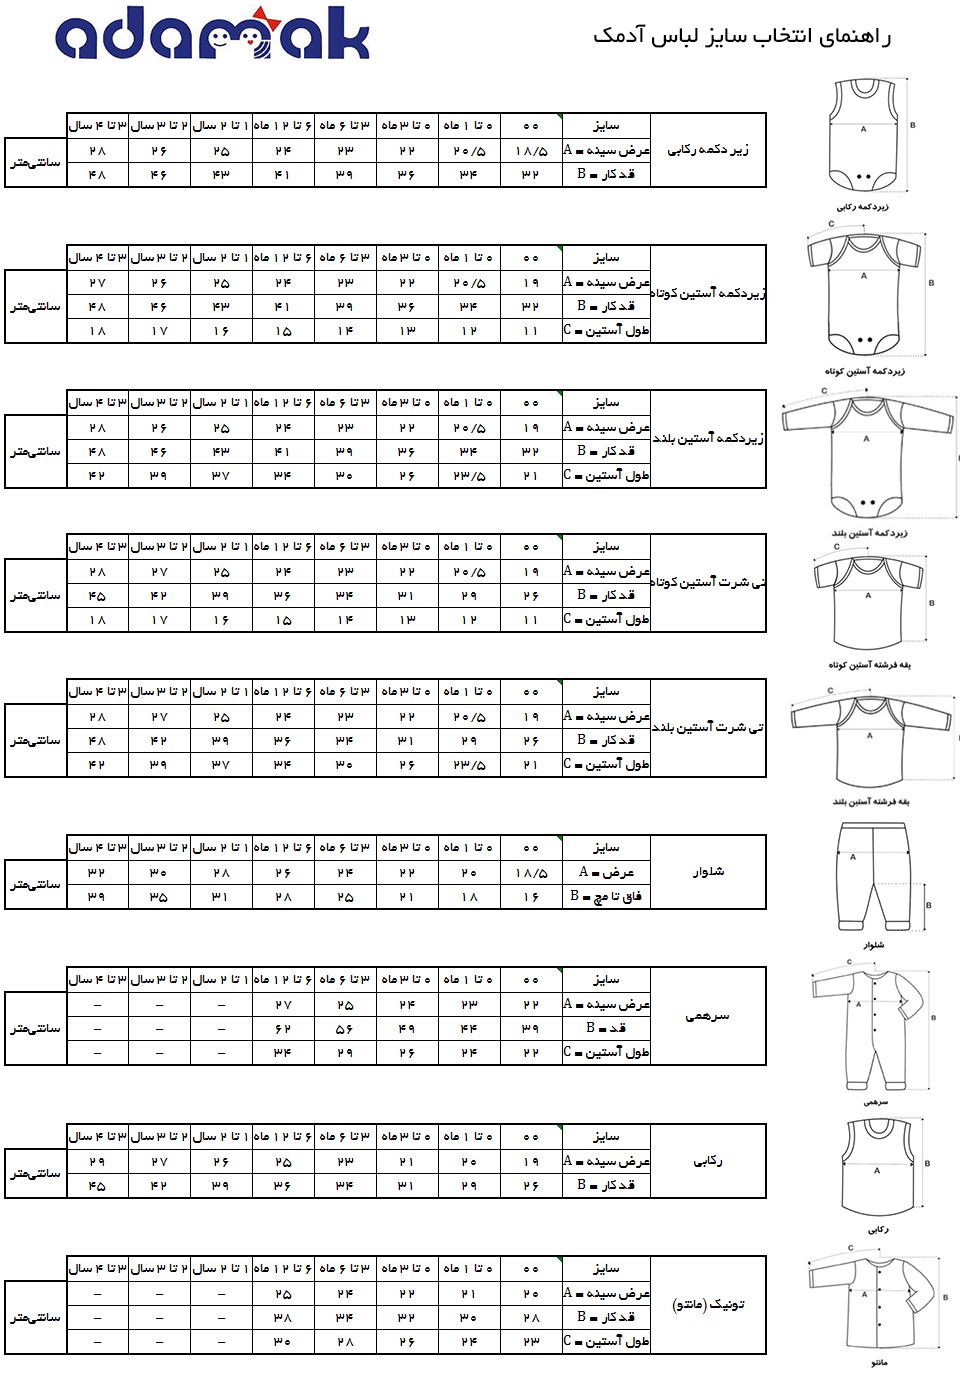 لباس سرهمی آدمک مدل Carriage infographic